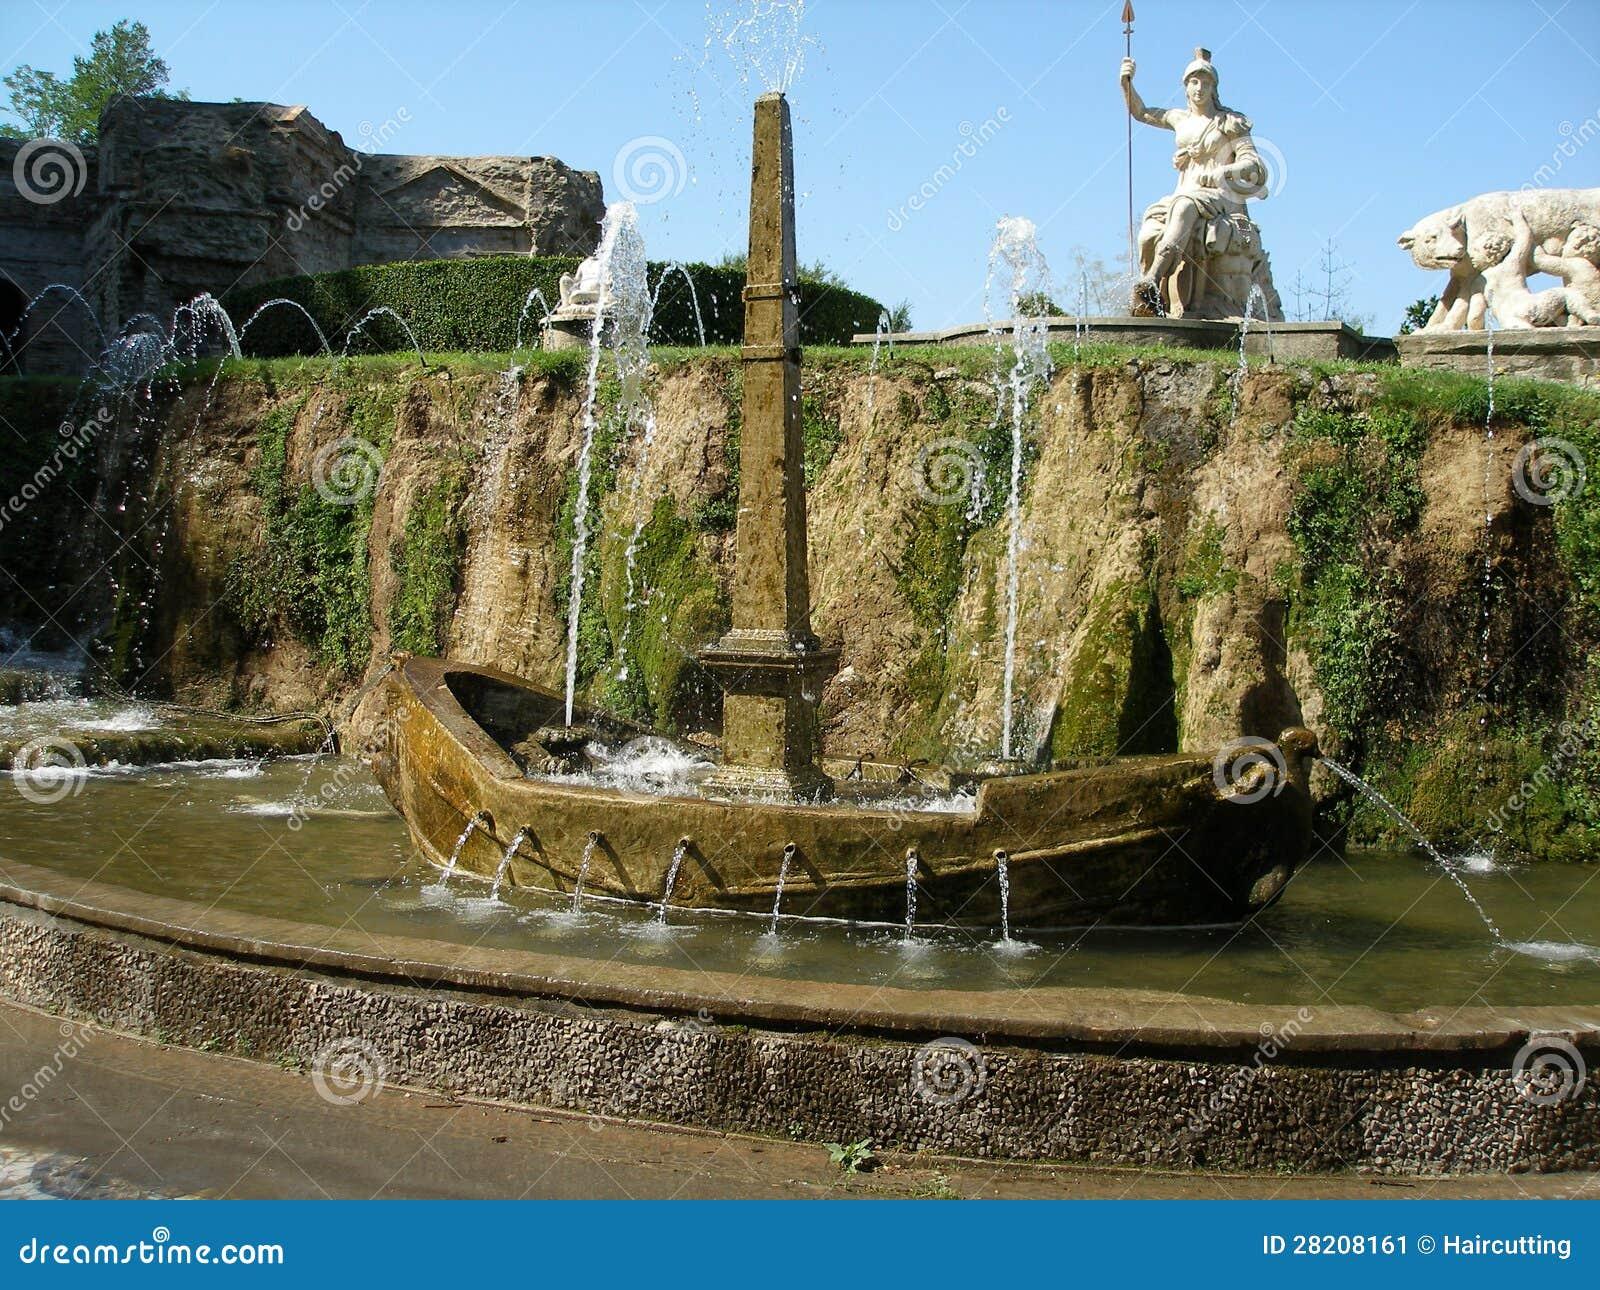 Fountain In Garden At Villa D\'Este Stock Image - Image of water ...